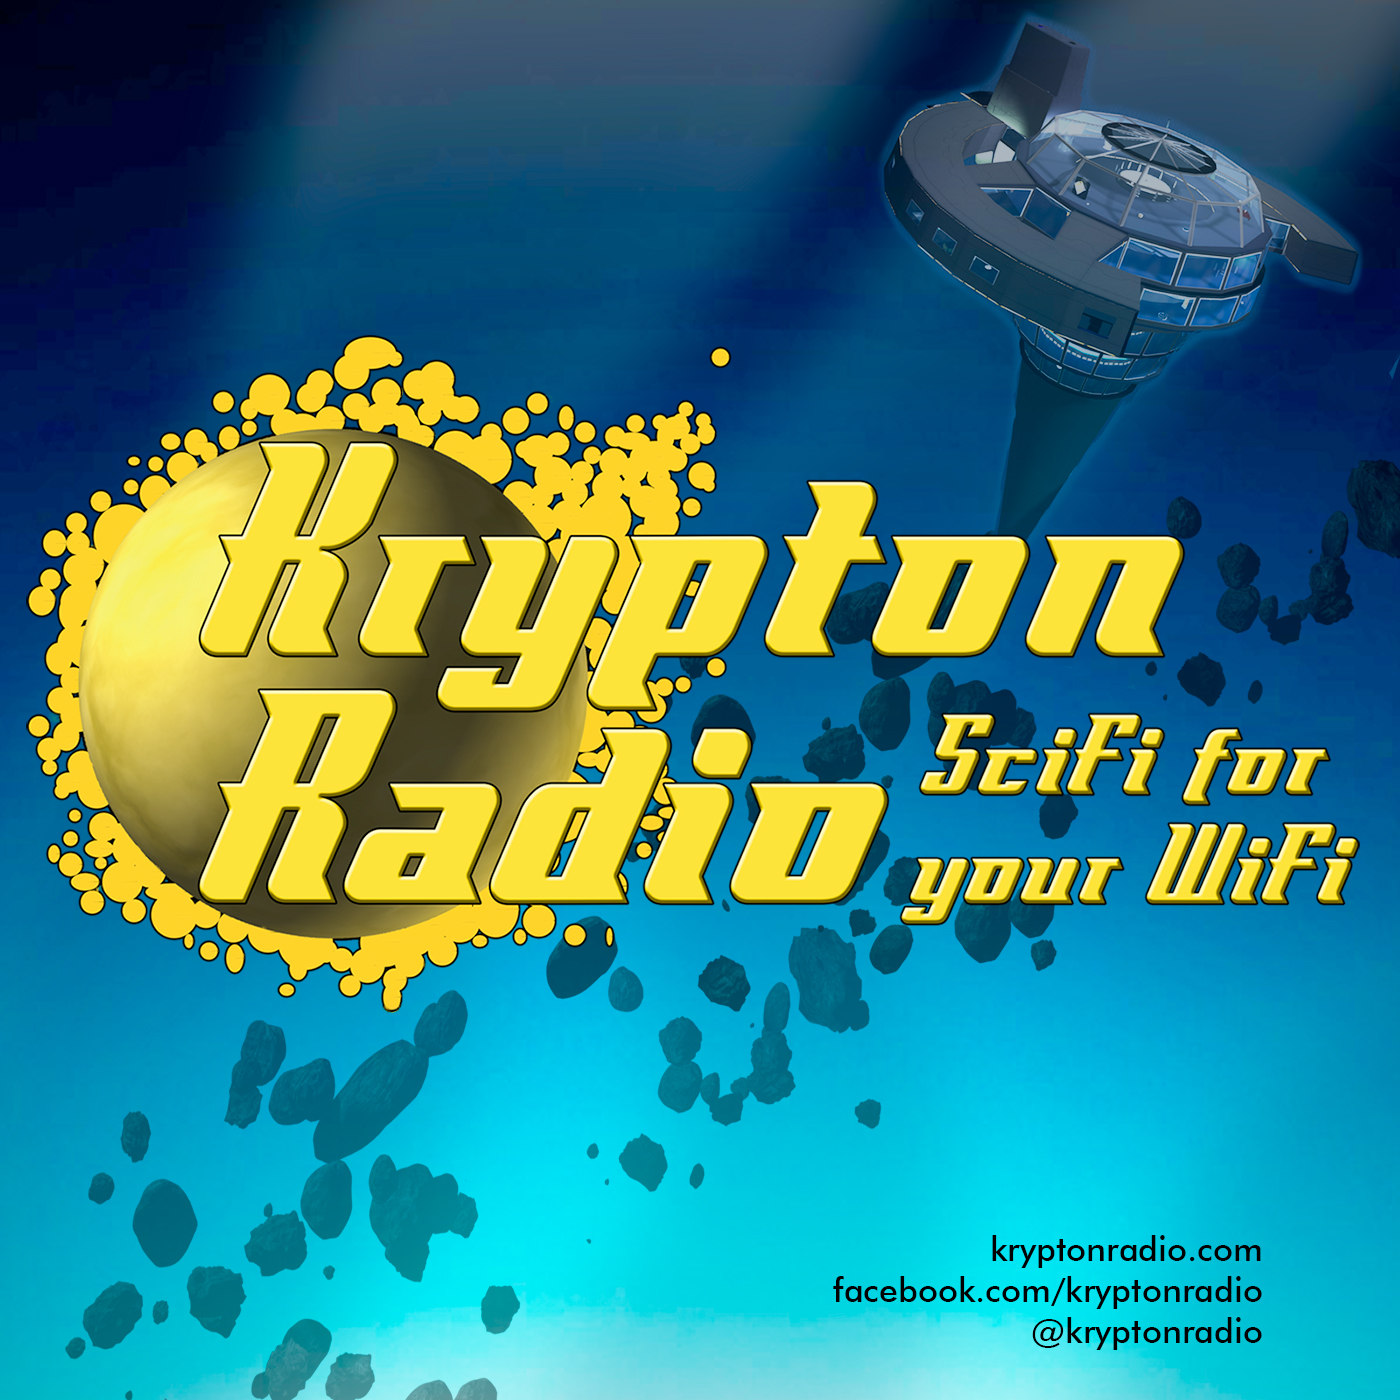 Krypton Radio logo